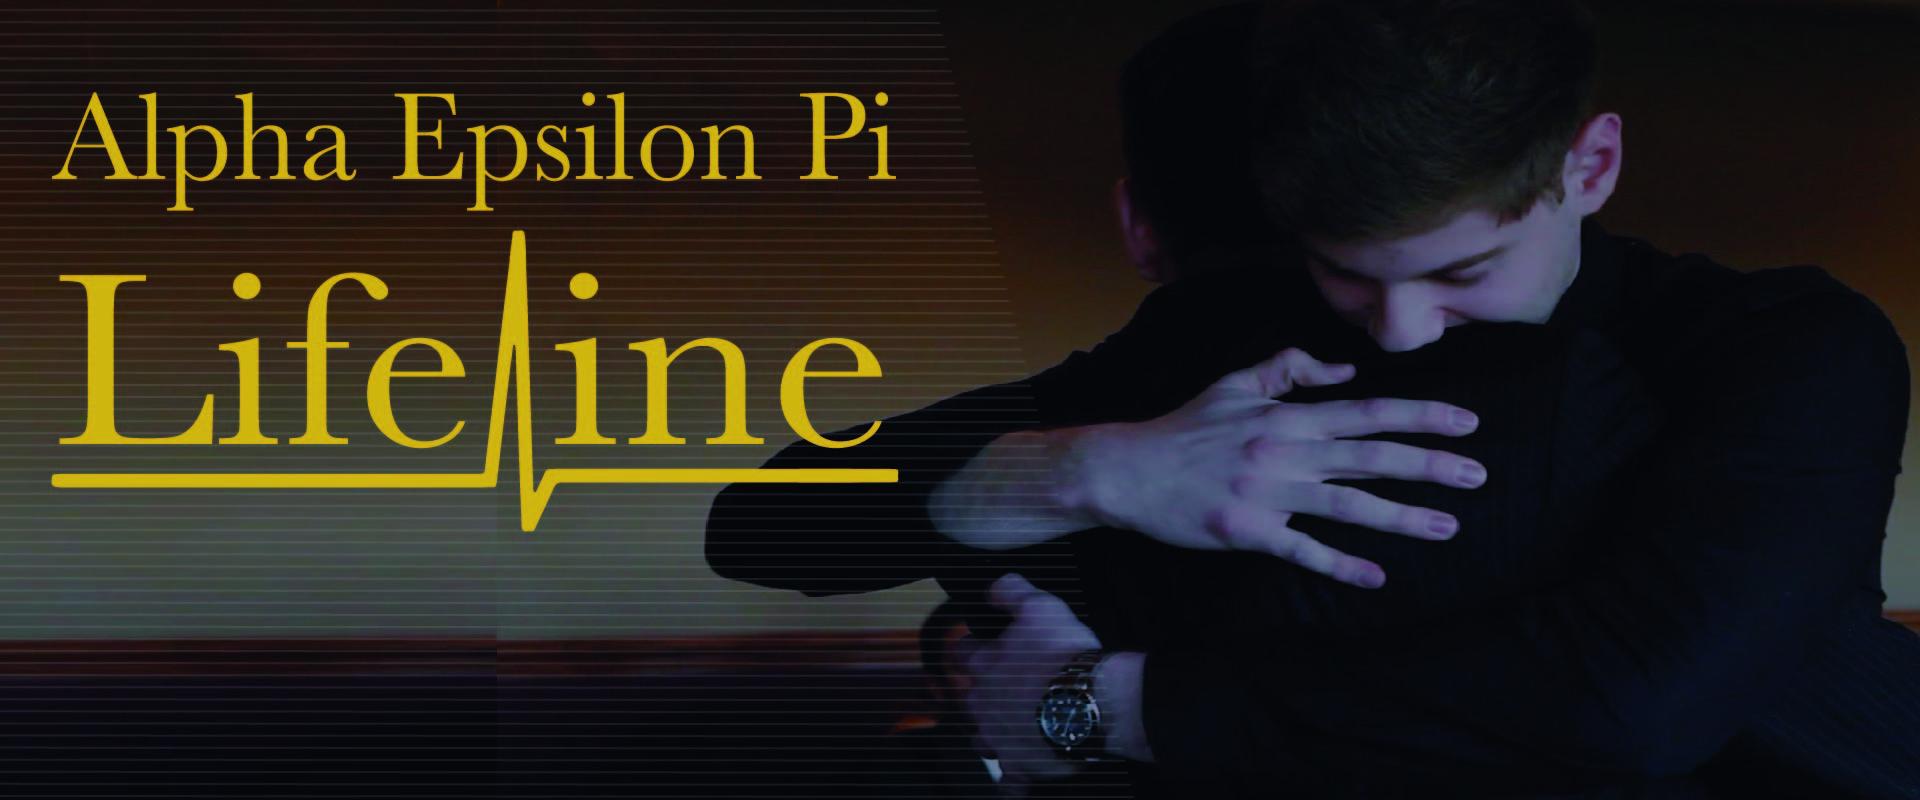 AEPi Lifeline Feature-02